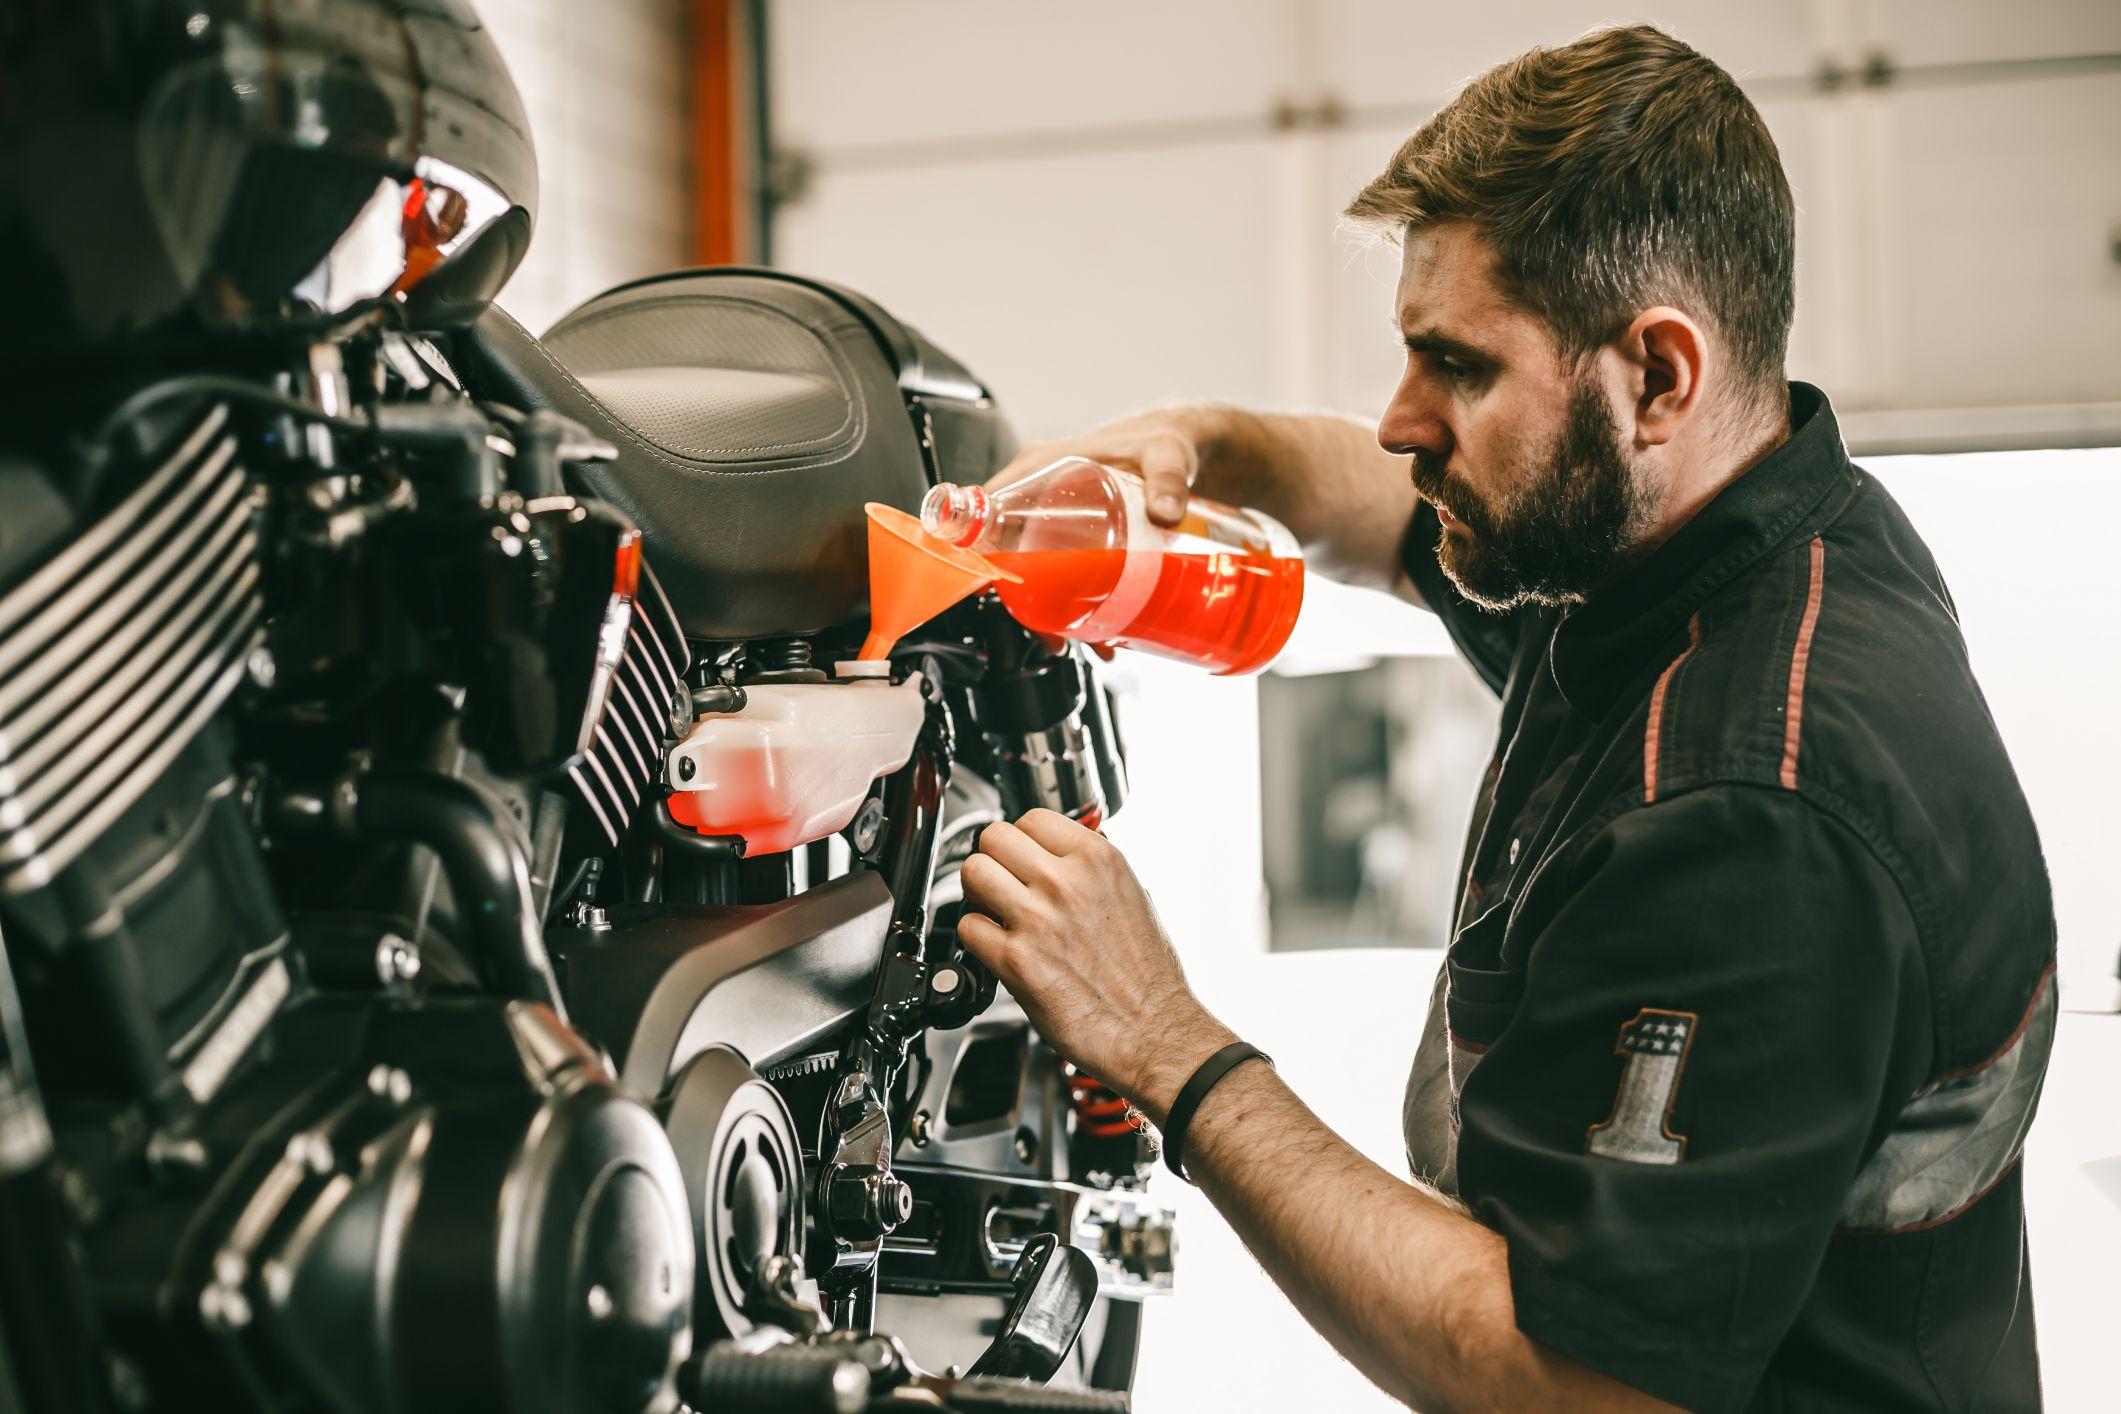 Motorcycles - Repairing & Service